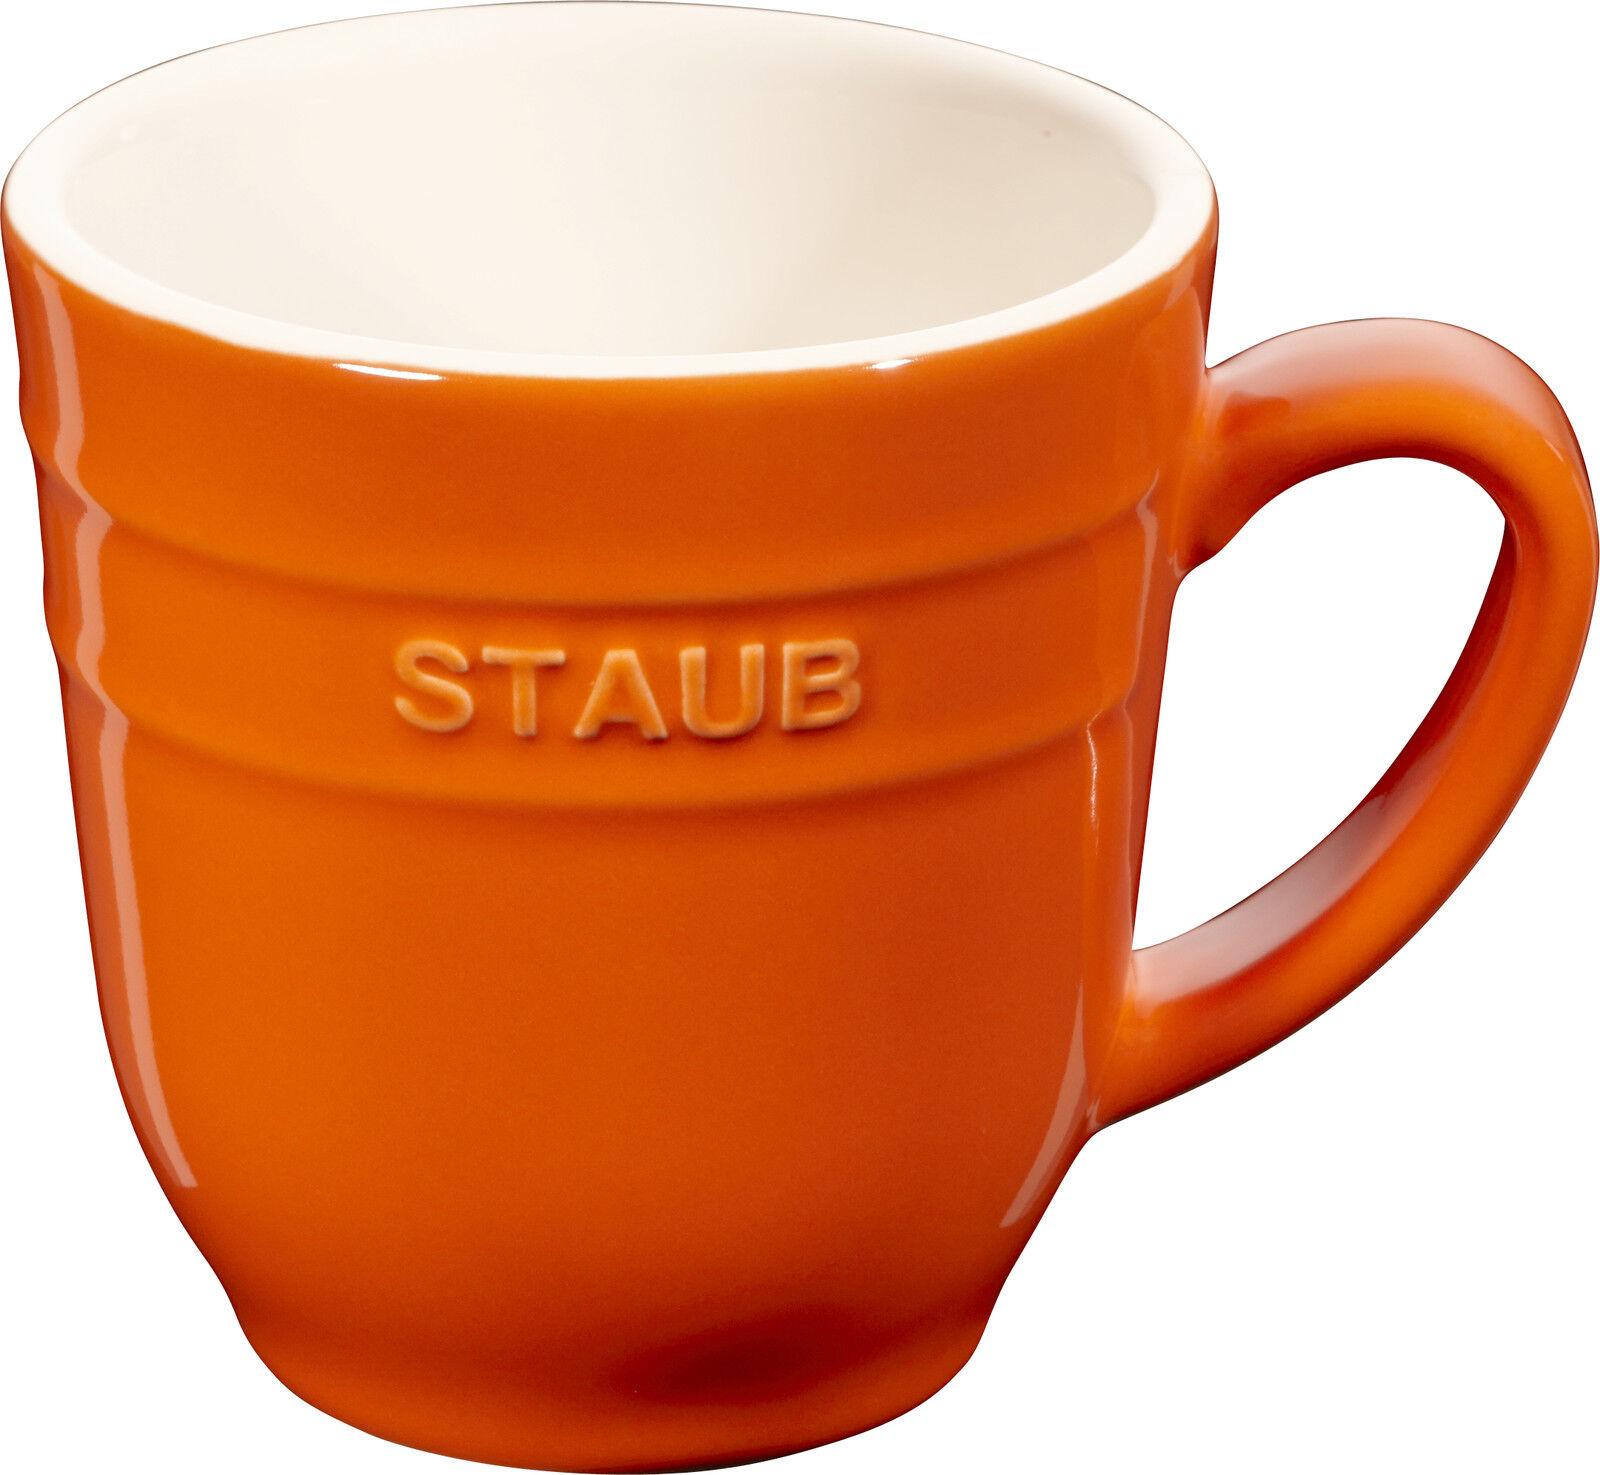 4 Set STAUB céramique Gobelet Tasse à café tasse ROND Orange 0,35L